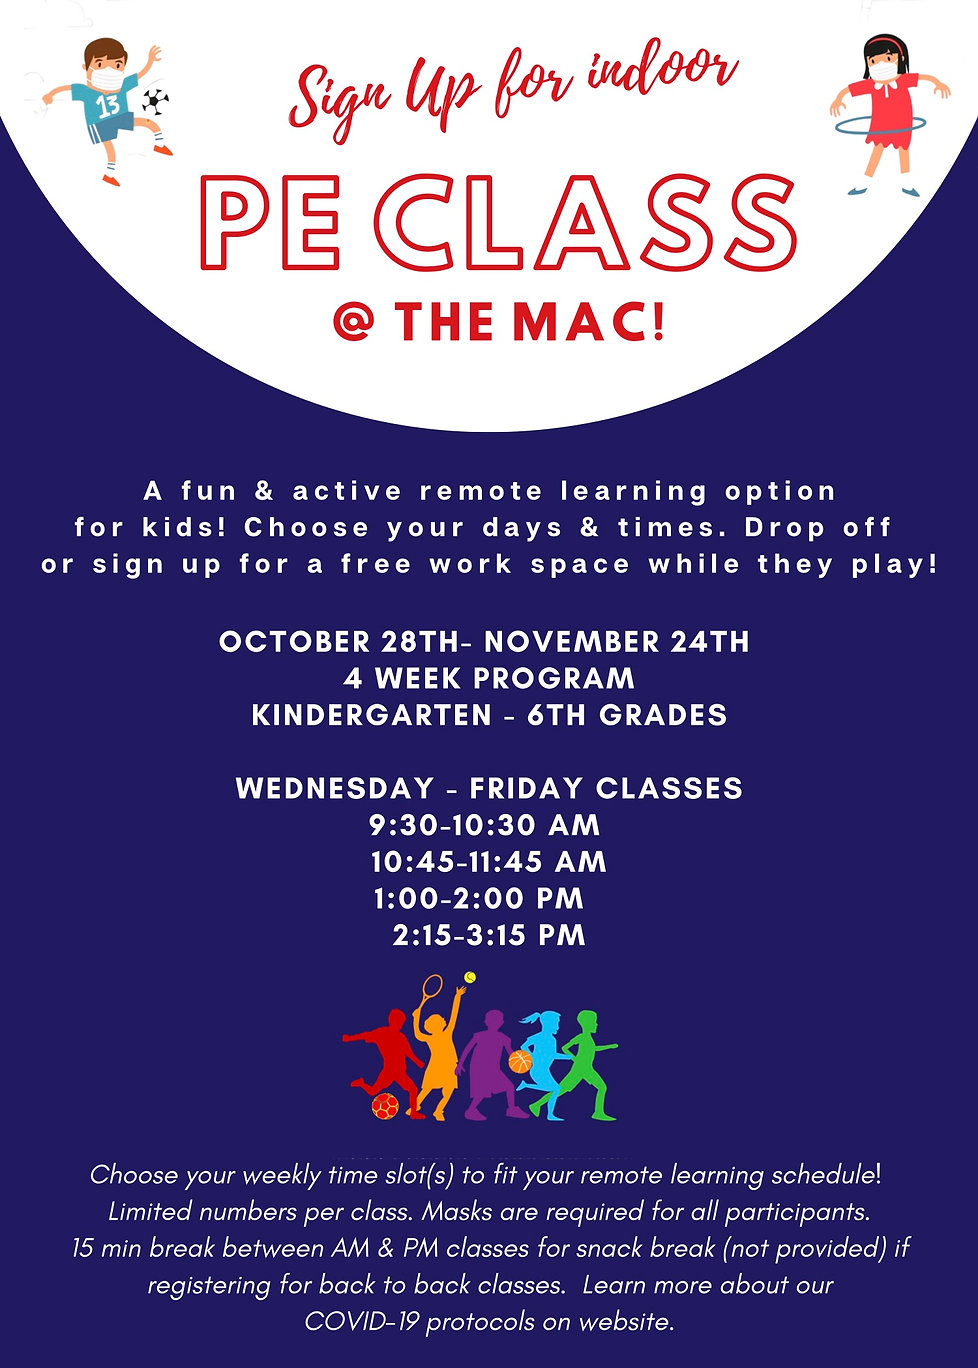 PE Class at the MAC Flyer JPEG.jpg